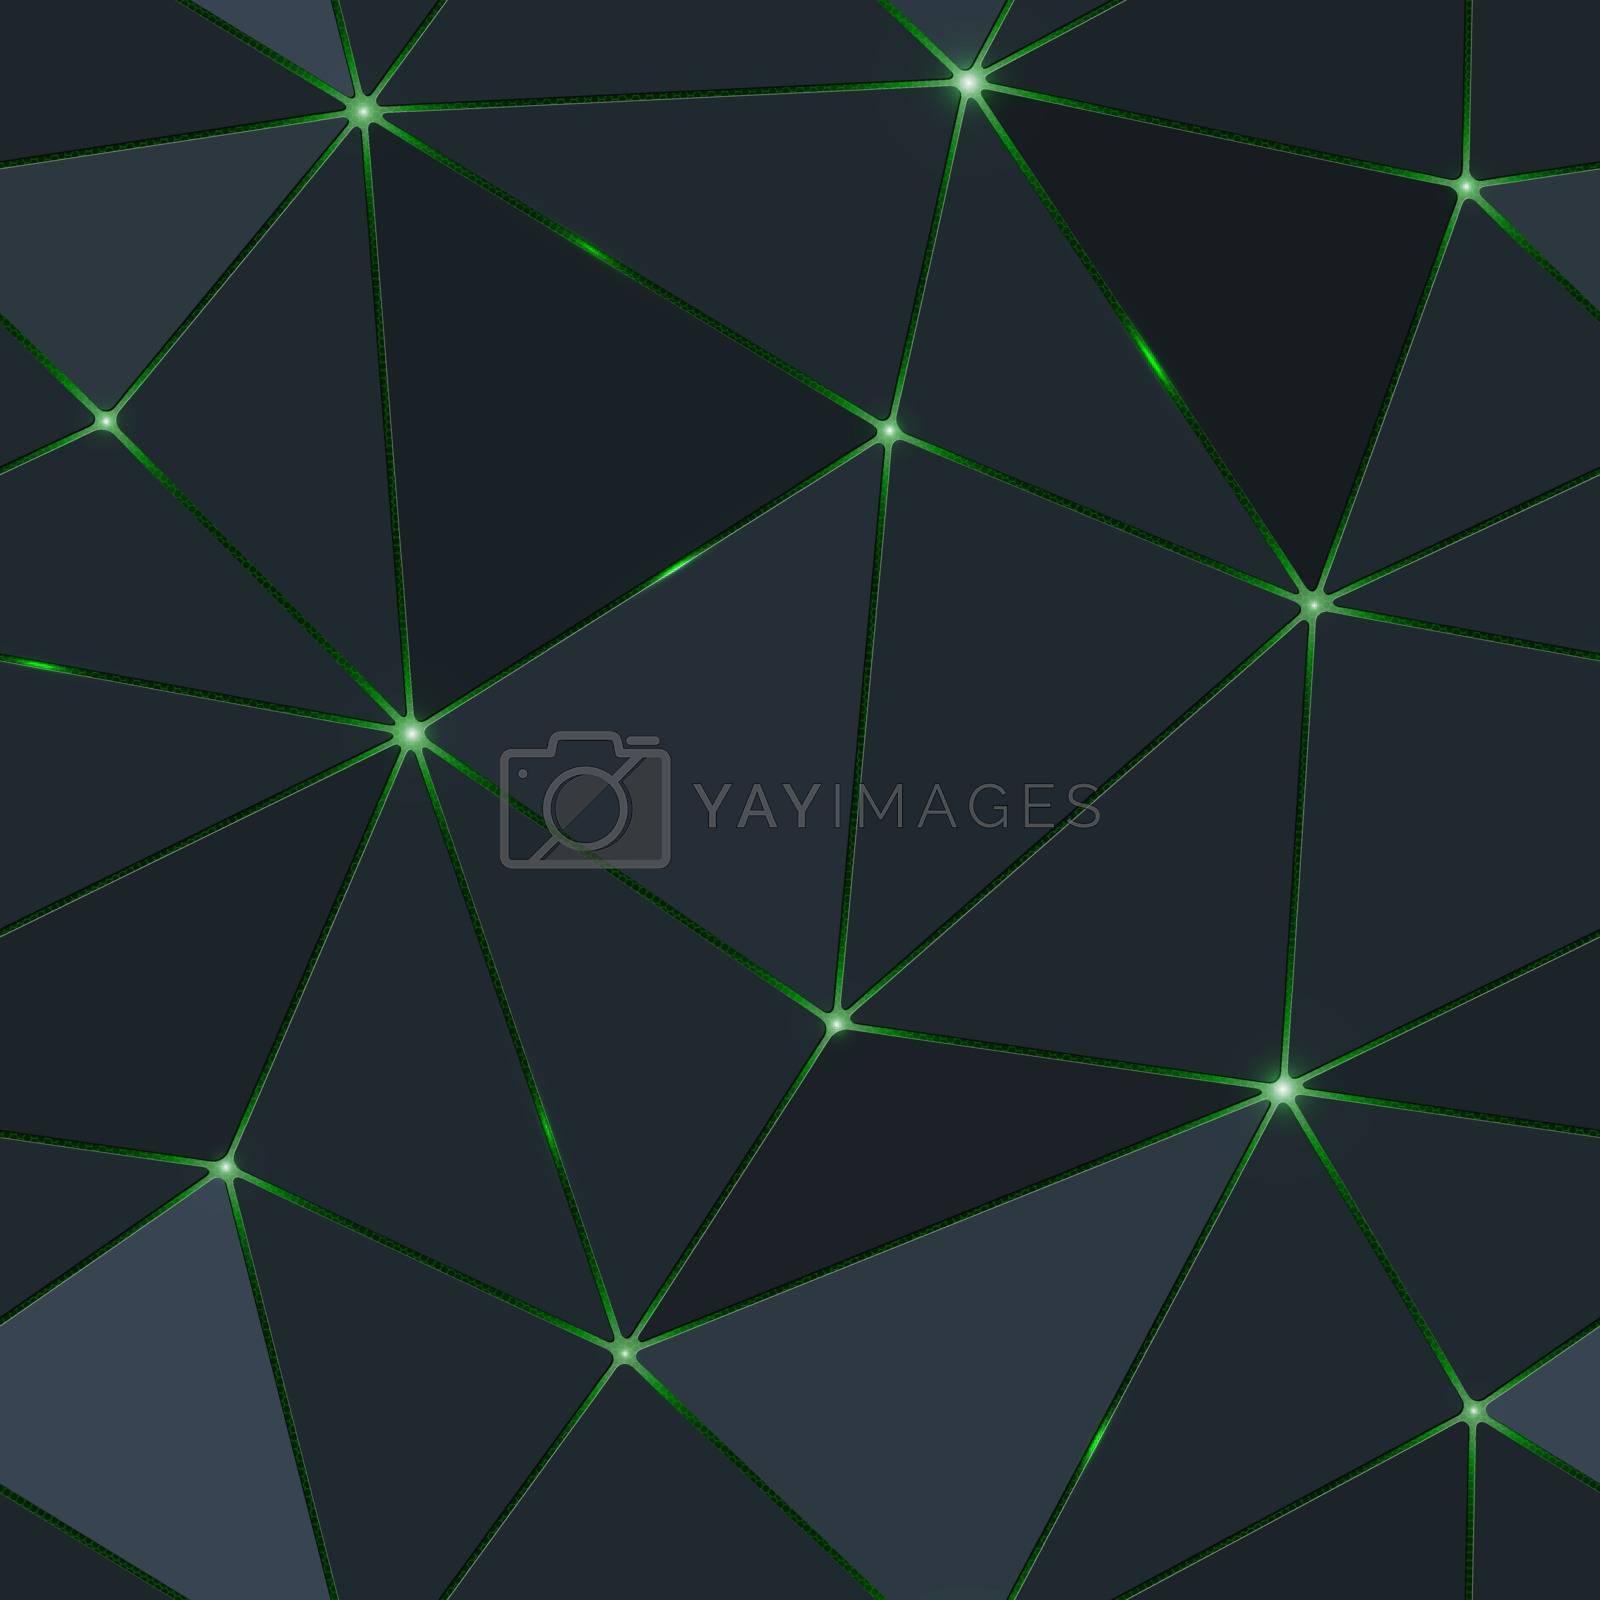 Seamless dark polygon with green light.